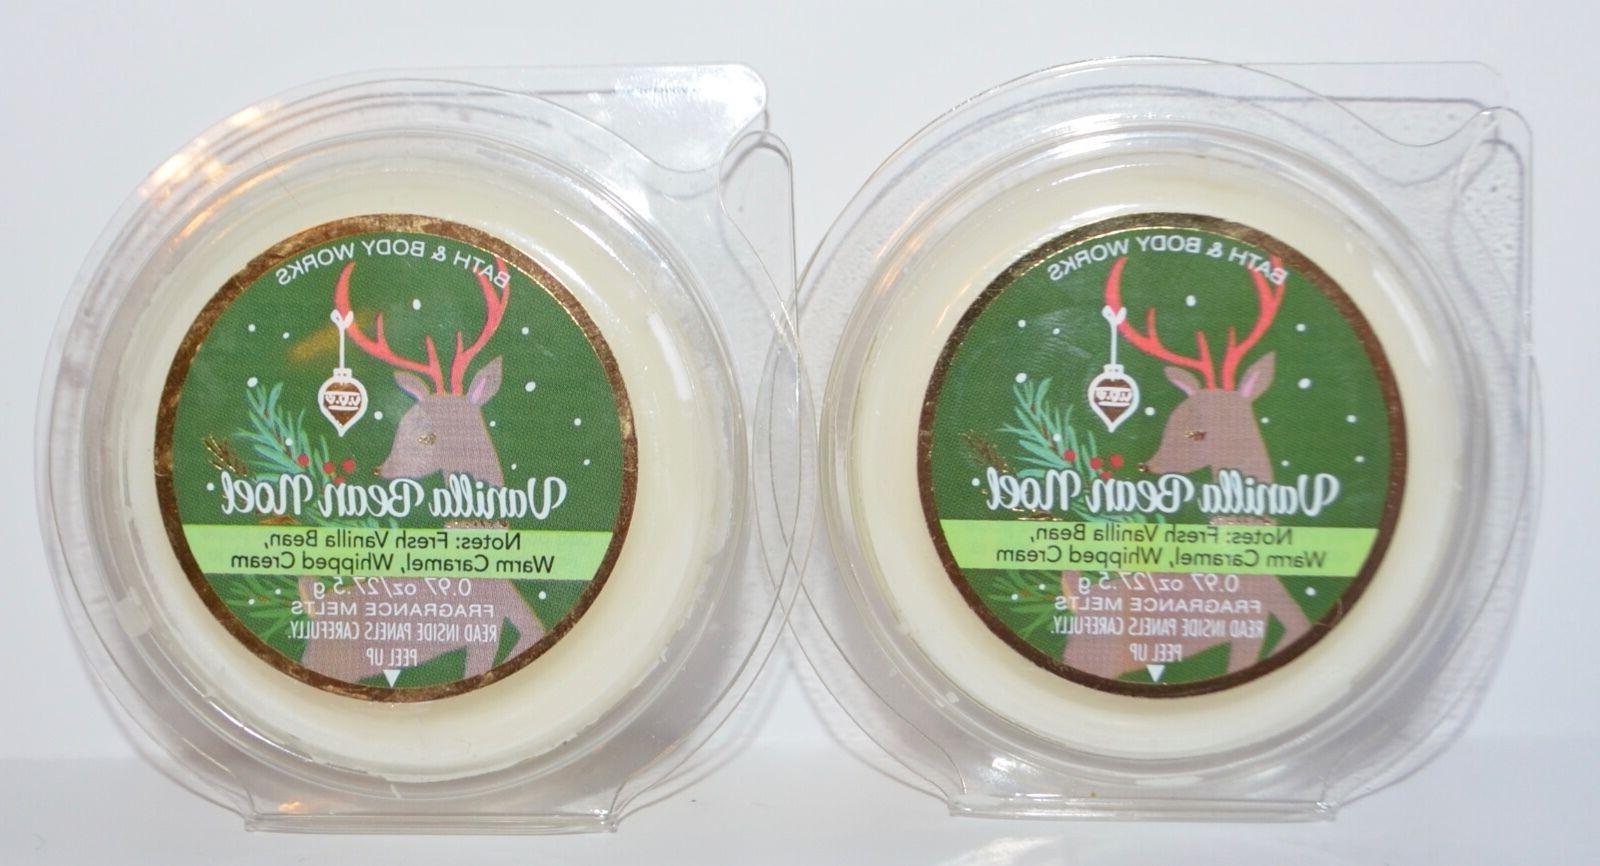 Bath & Body Works Wax Home Fragrance Melt Vanilla Bean Noel